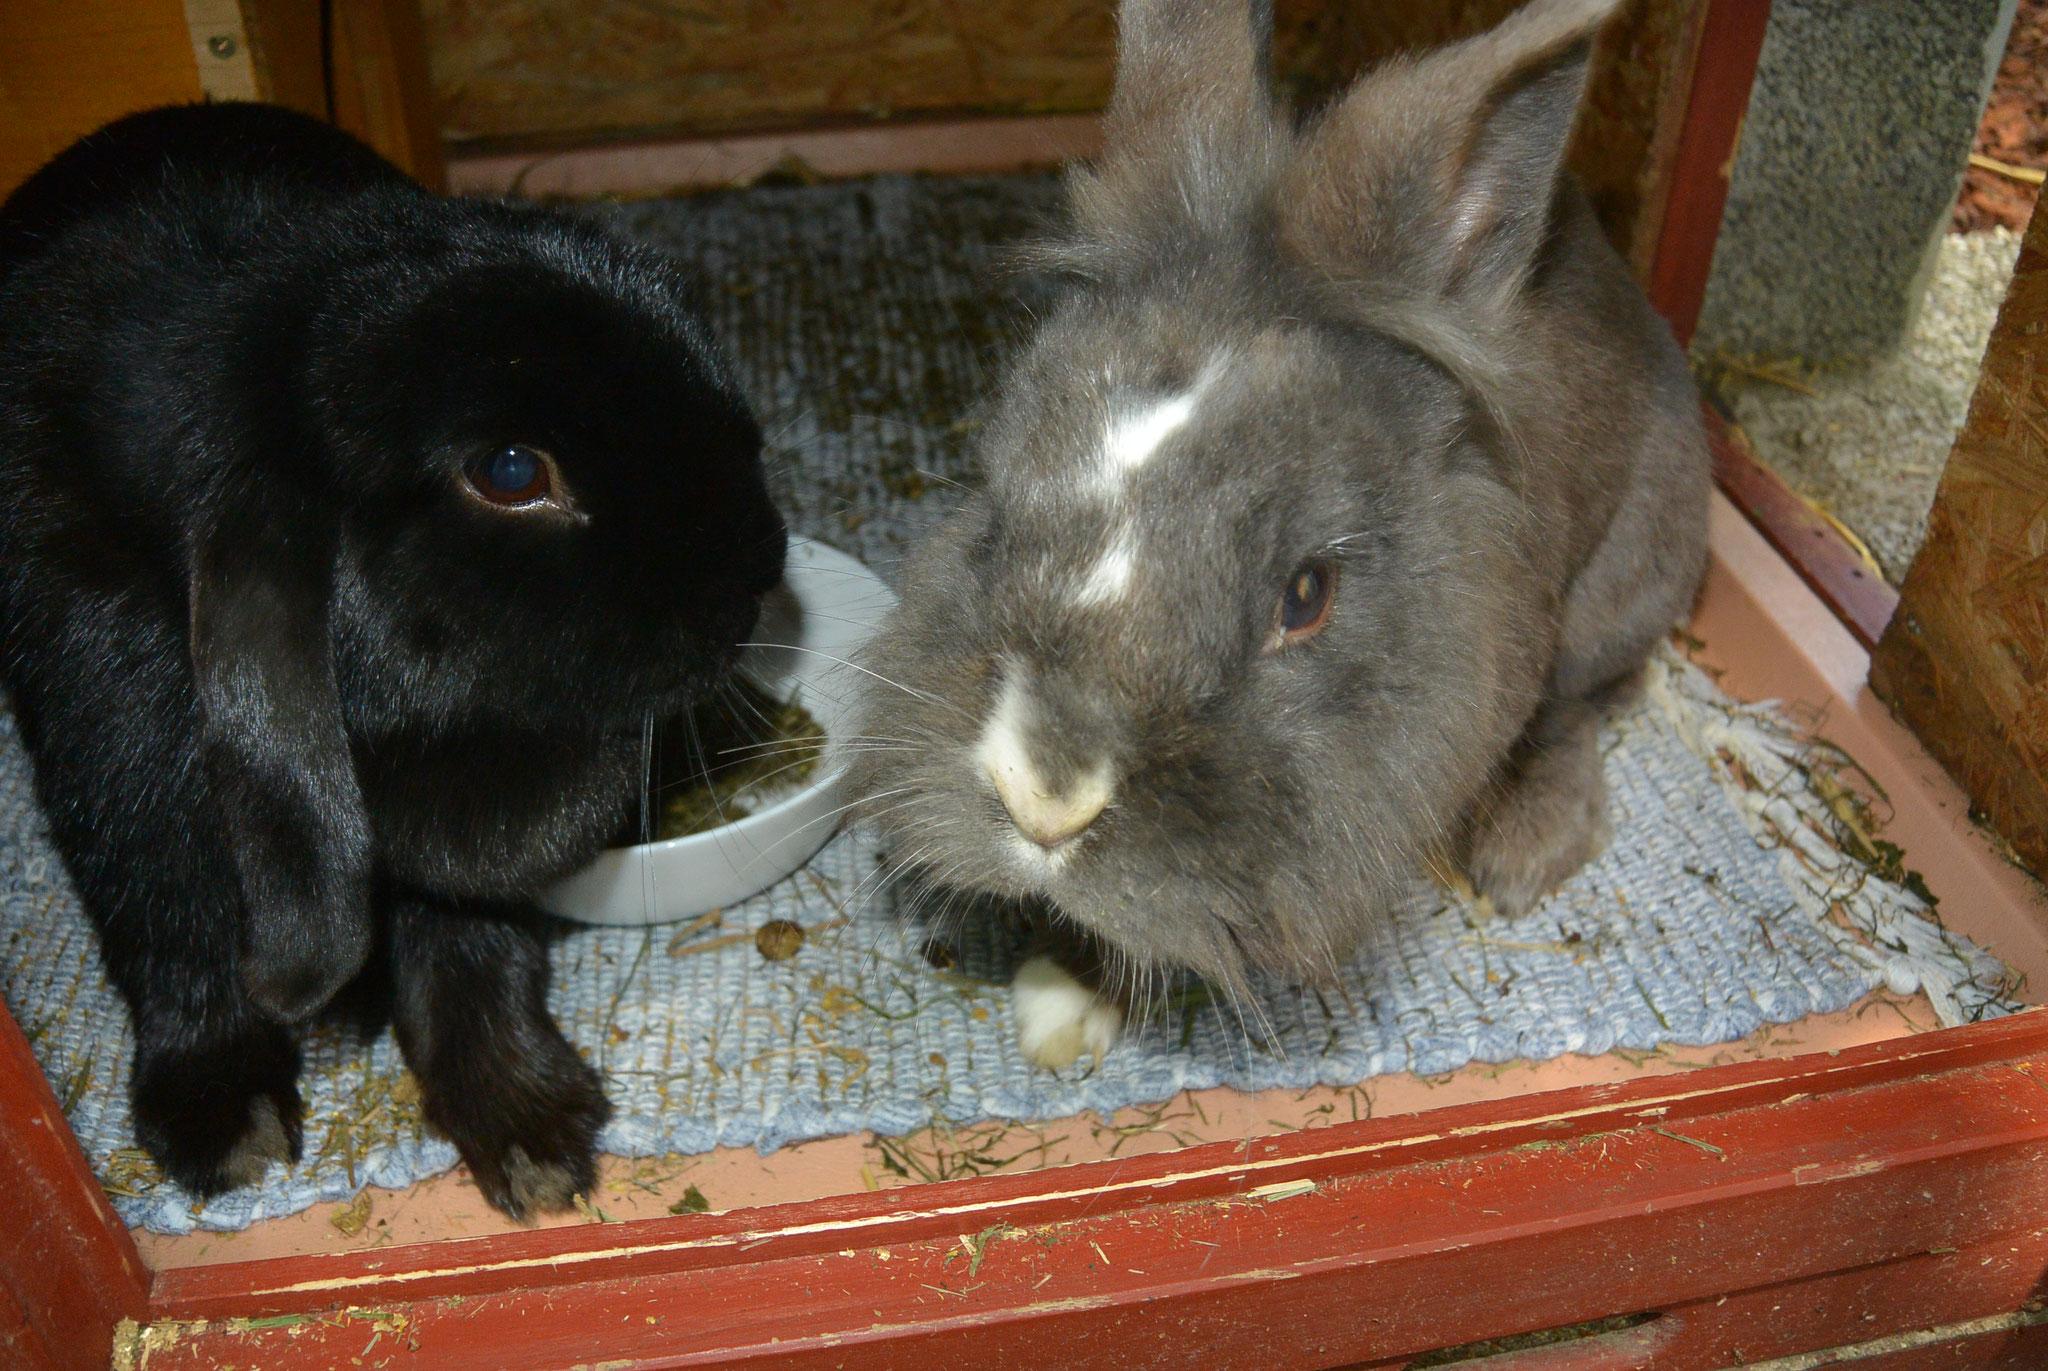 Polly & Merlin